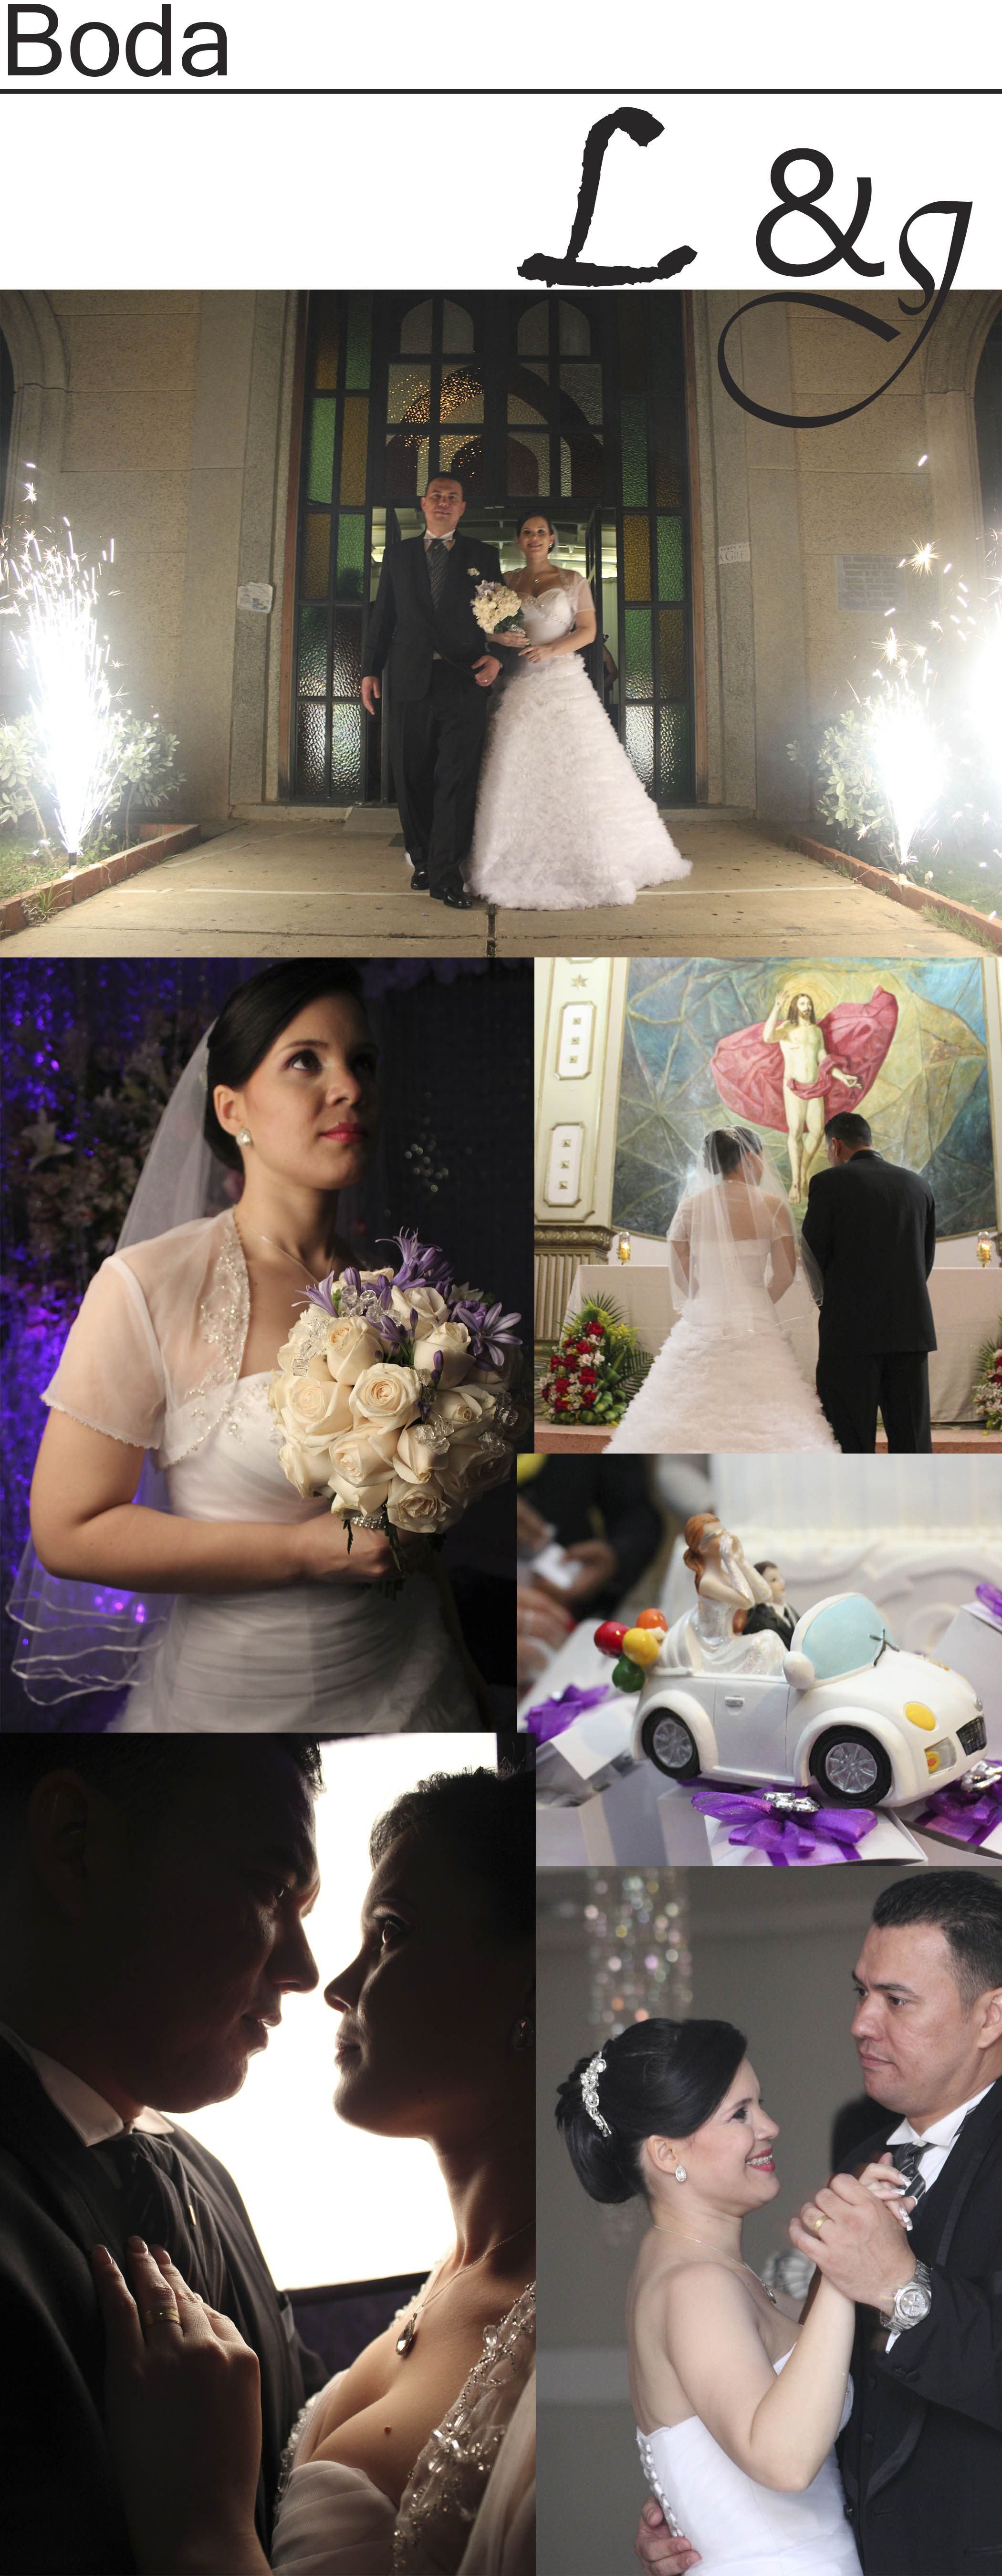 #Boda #Love #wedding #MiTrabajo